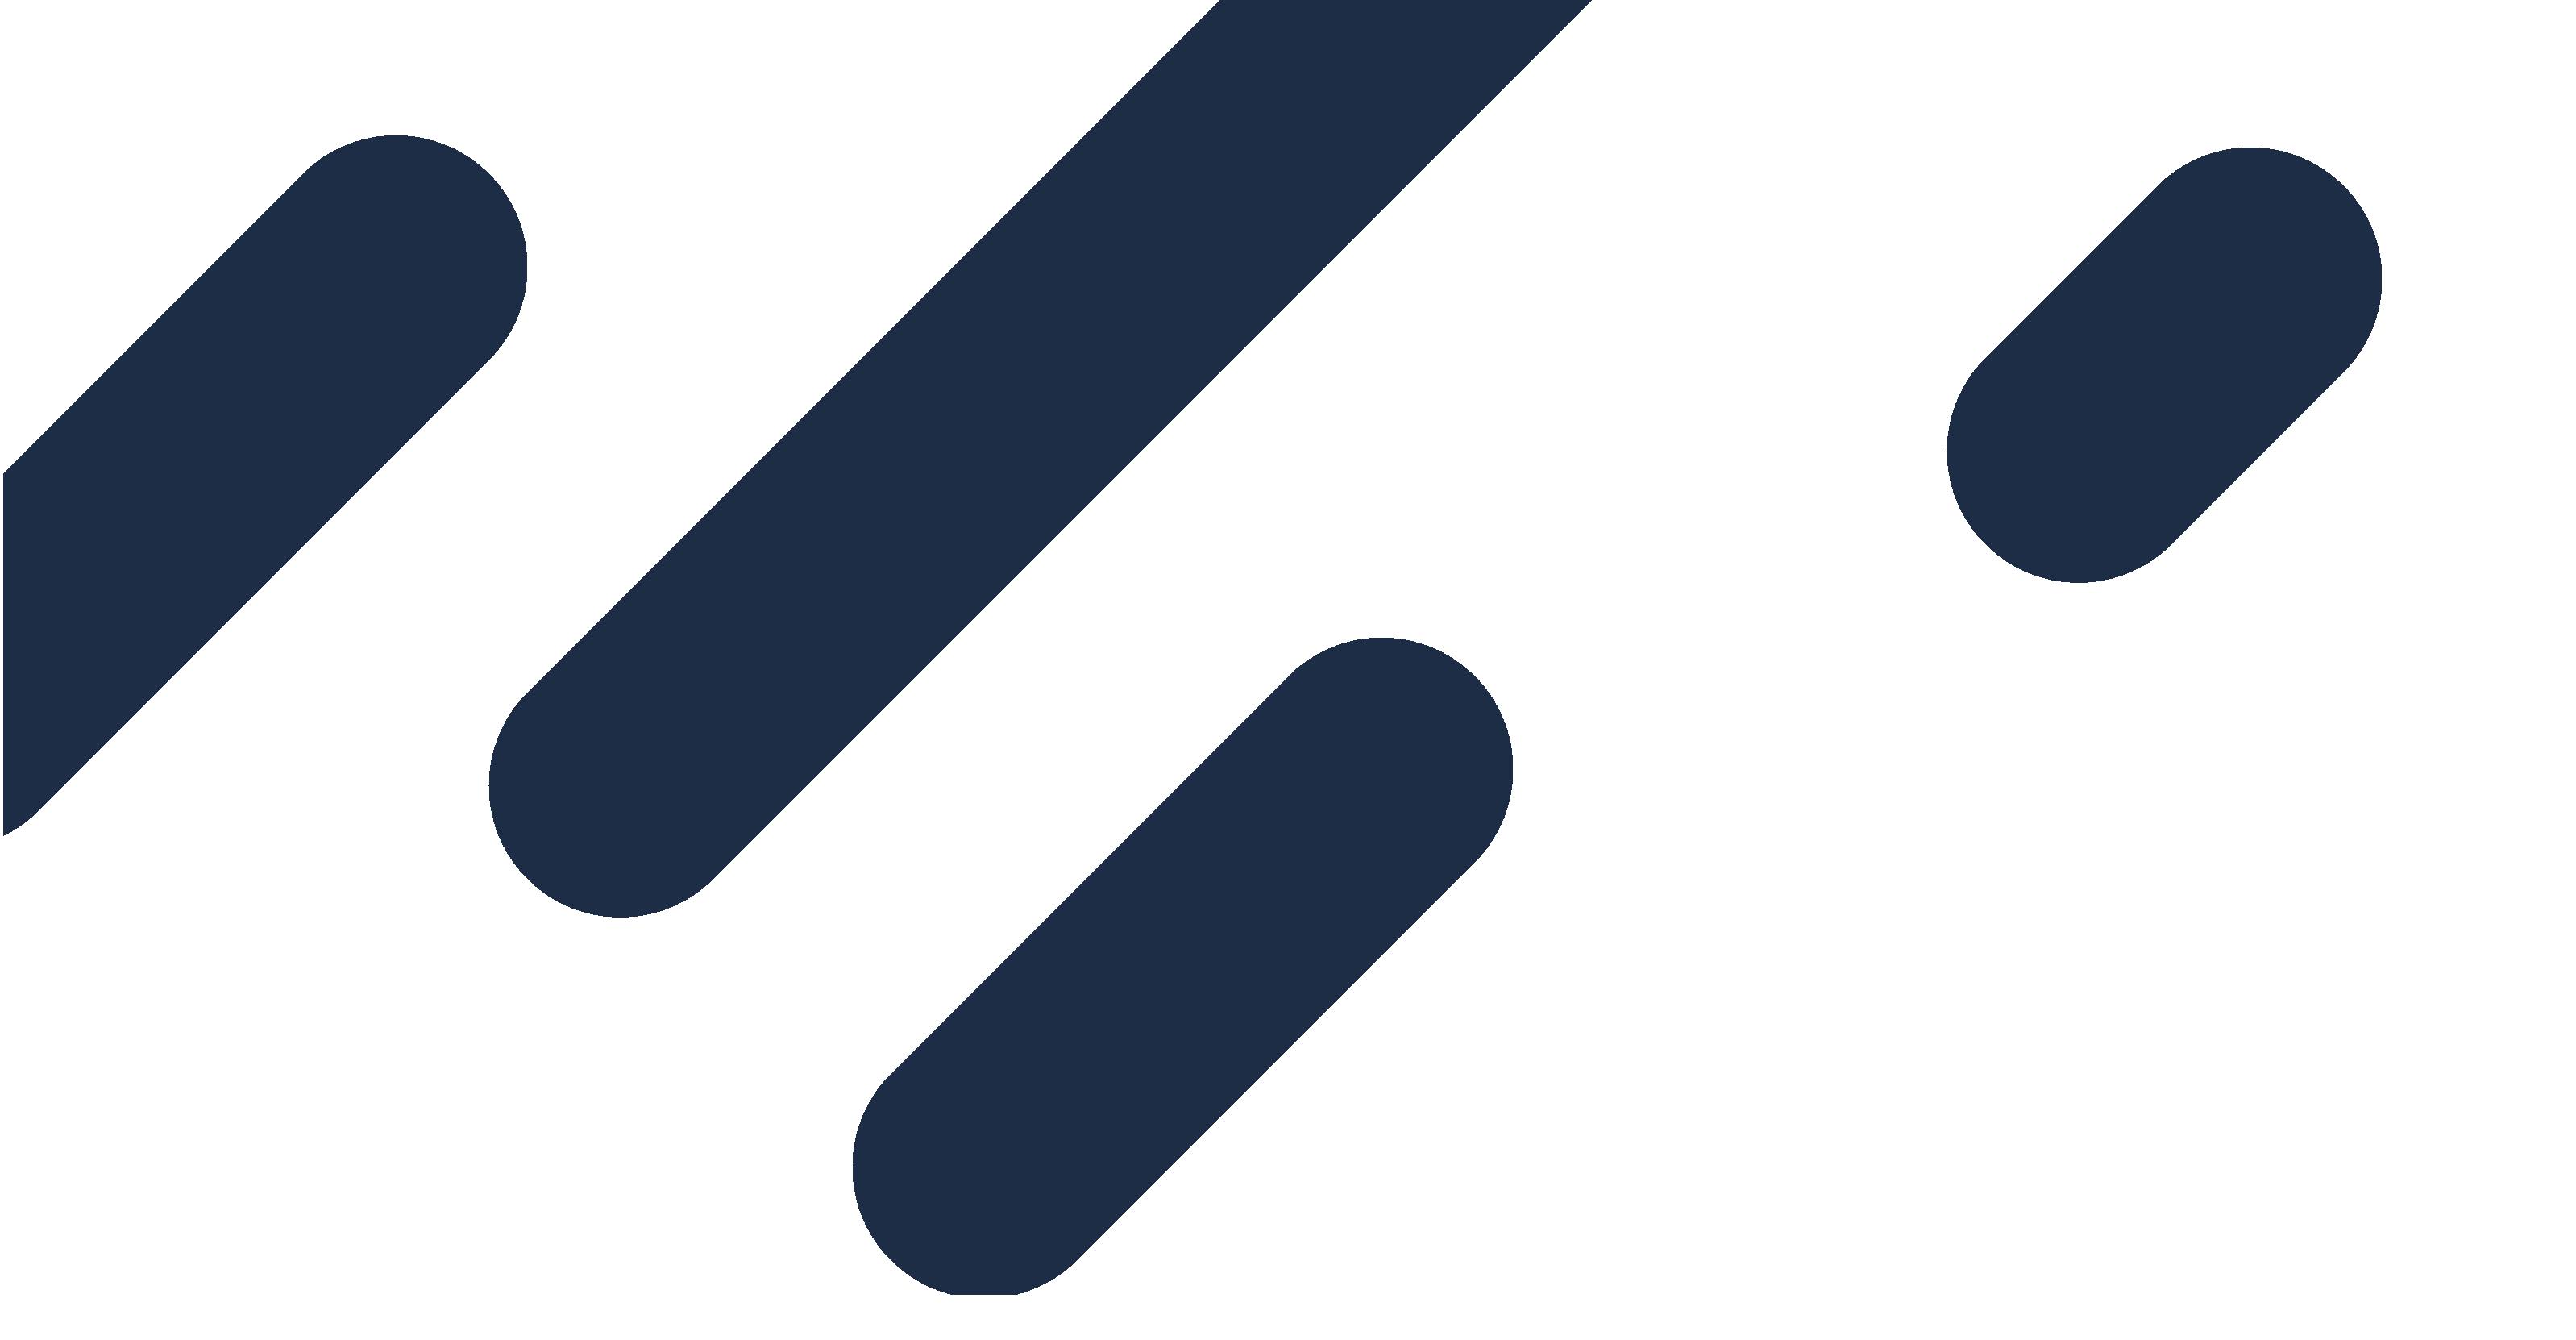 small-business-website-design-10